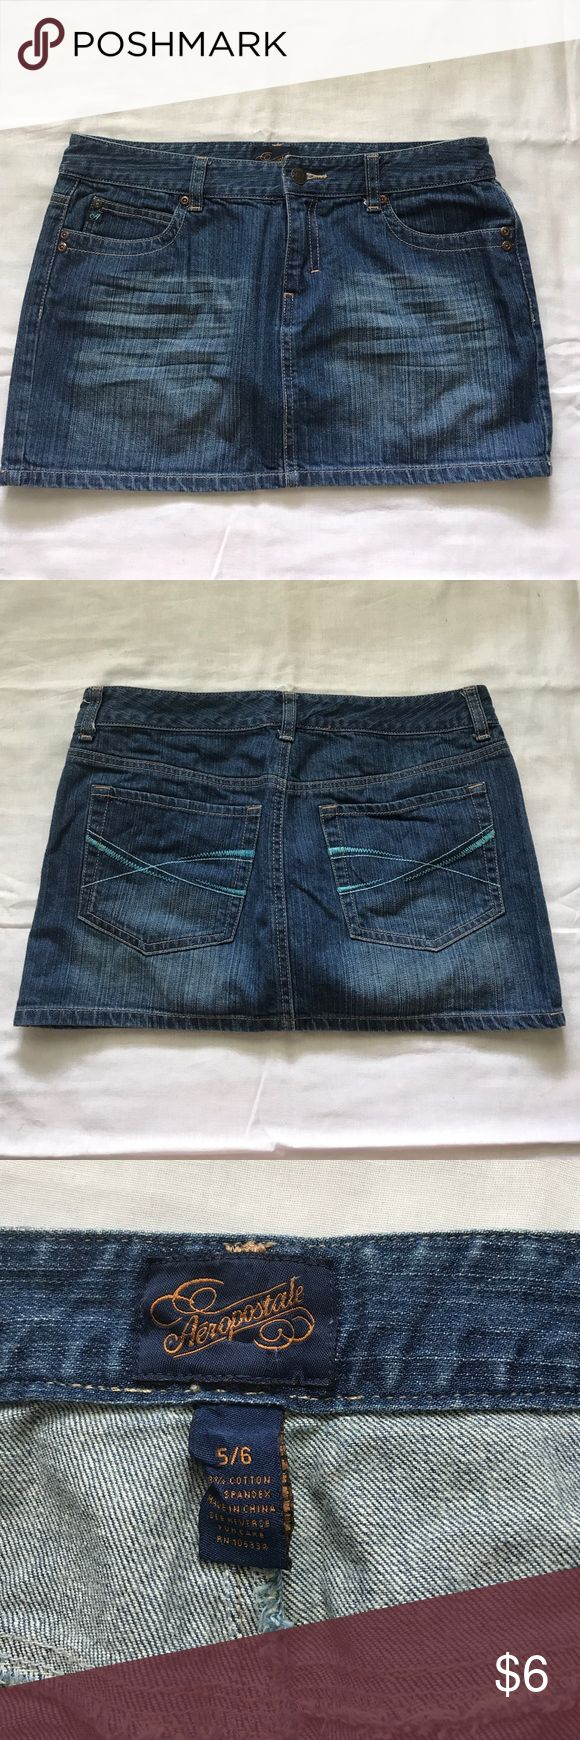 "Jean skirt sz 5/6 11.5"" long. 98% cotton. 2% spandex. Excellent condition. smoke-free home. Aeropostale Skirts Mini"